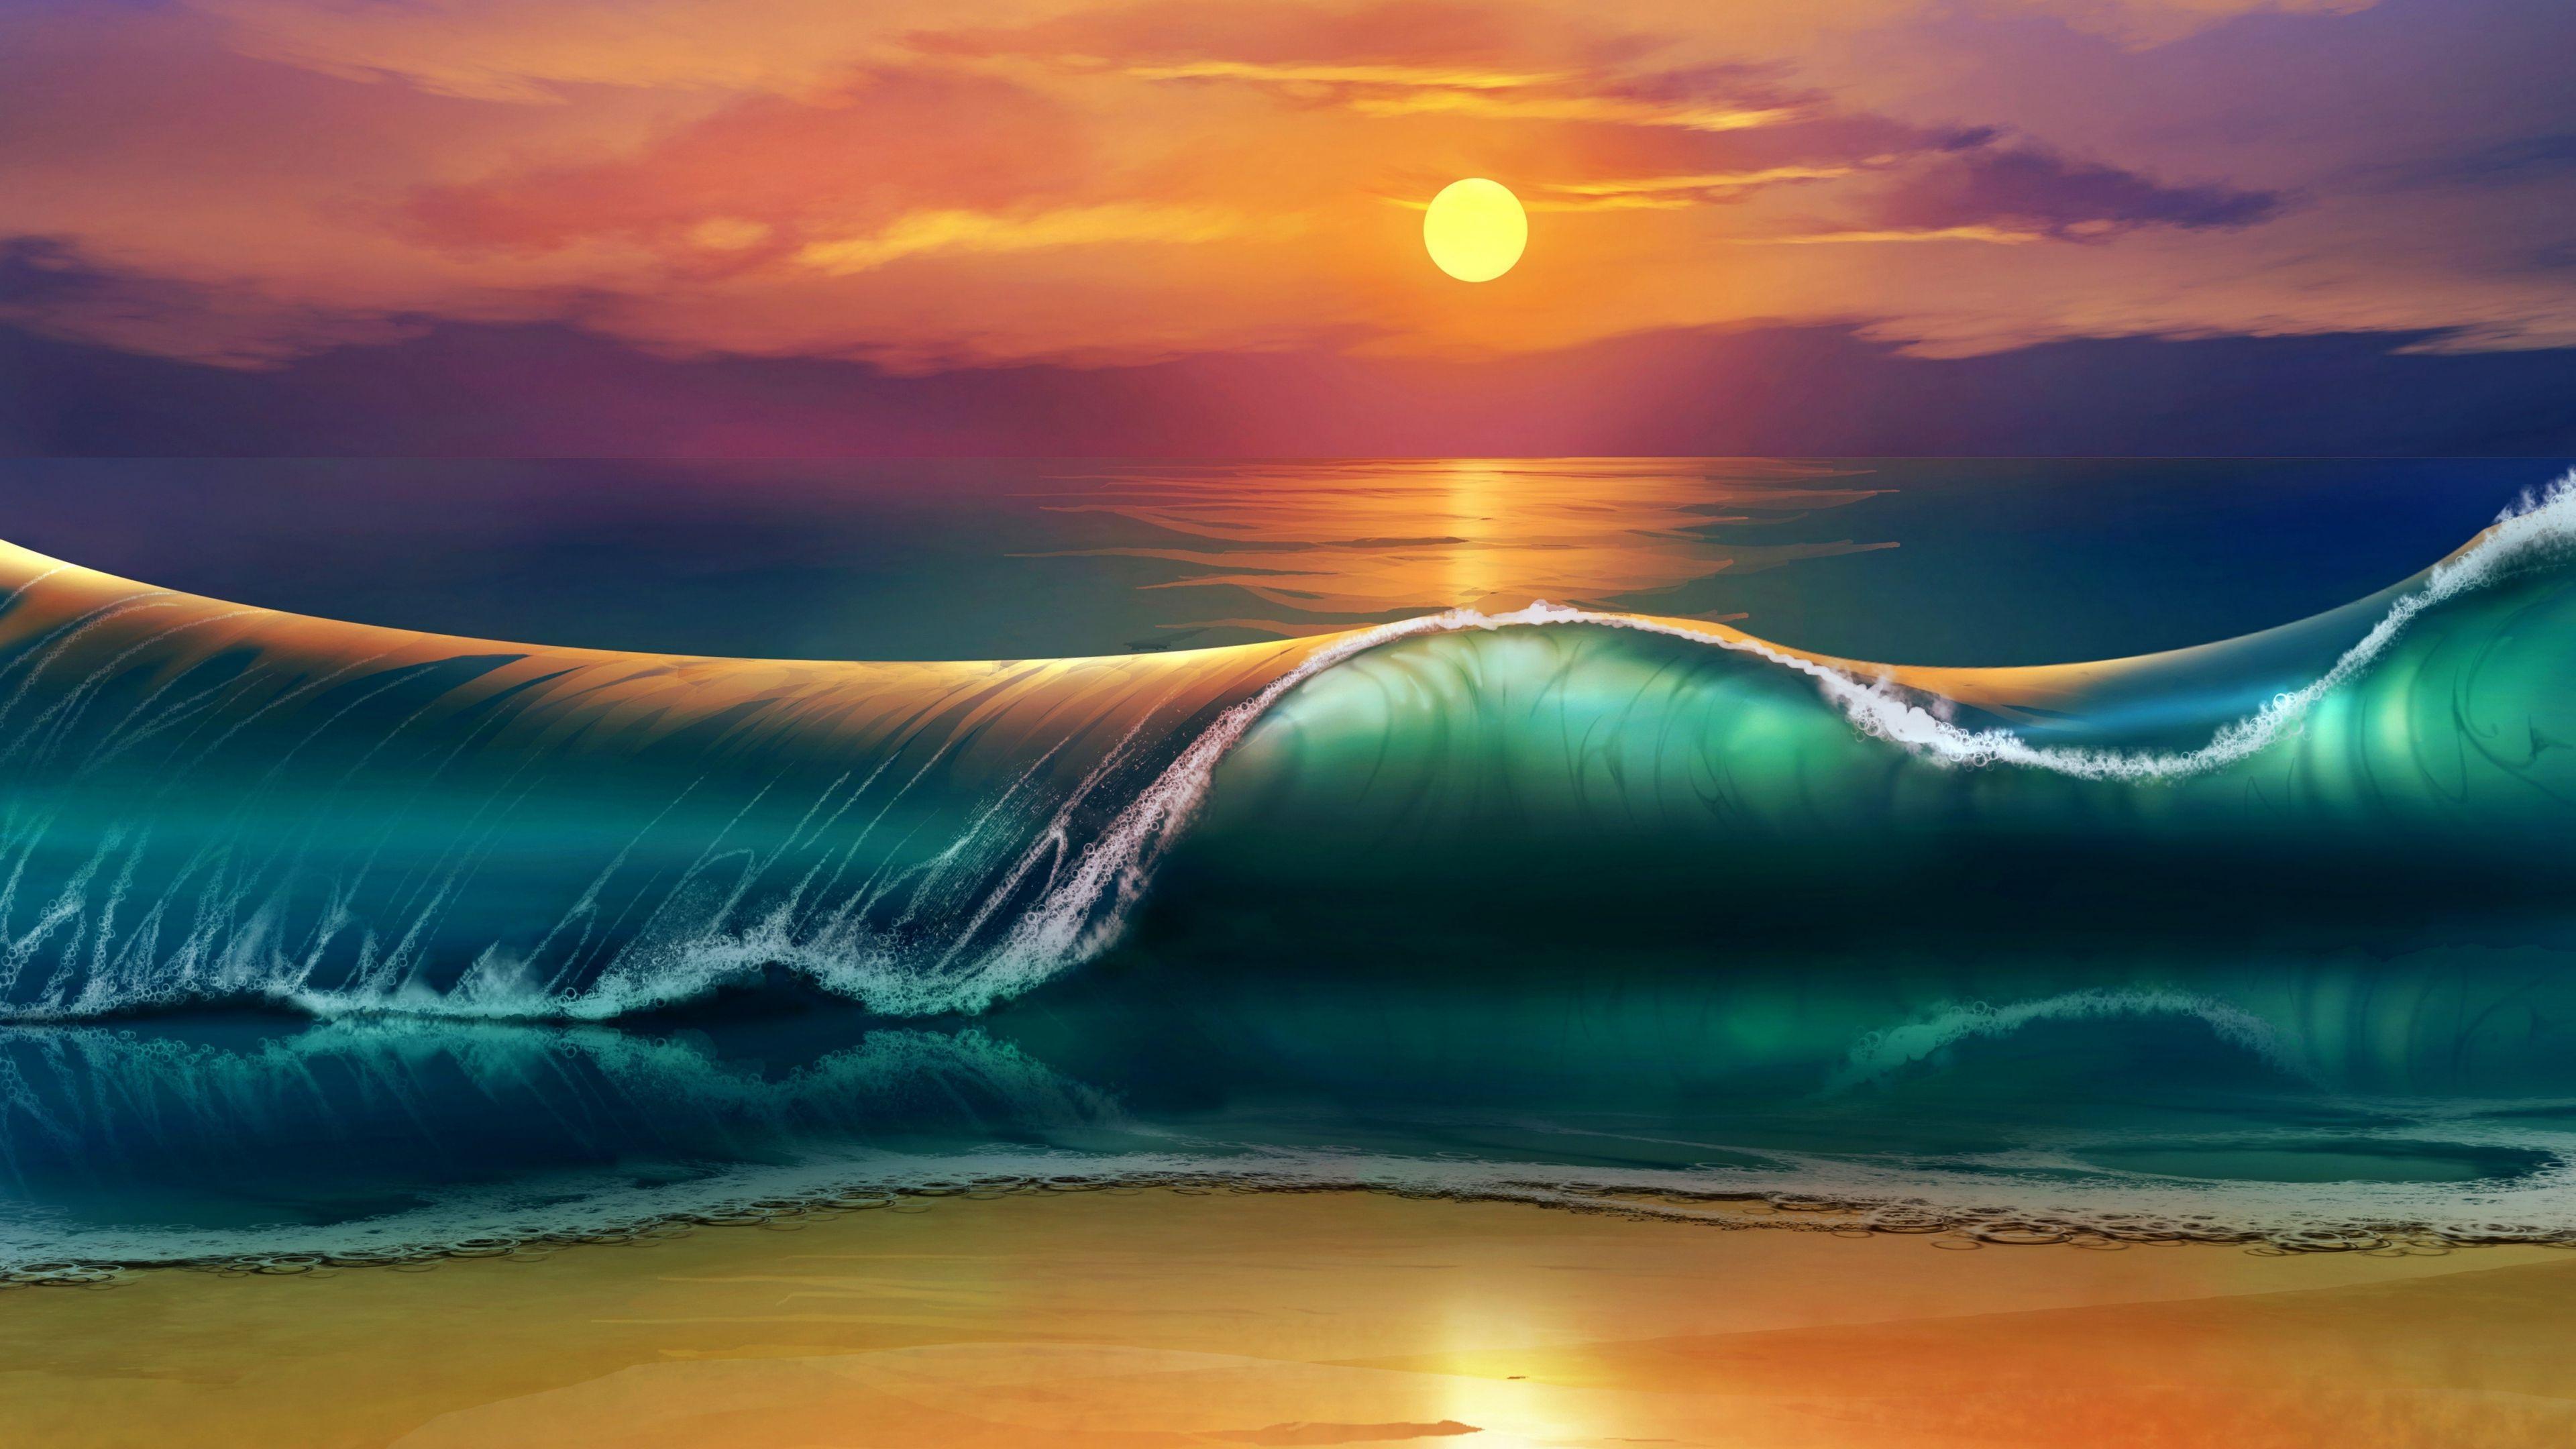 4K Ultra HD Beach Wallpapers - Top Free 4K Ultra HD Beach ...